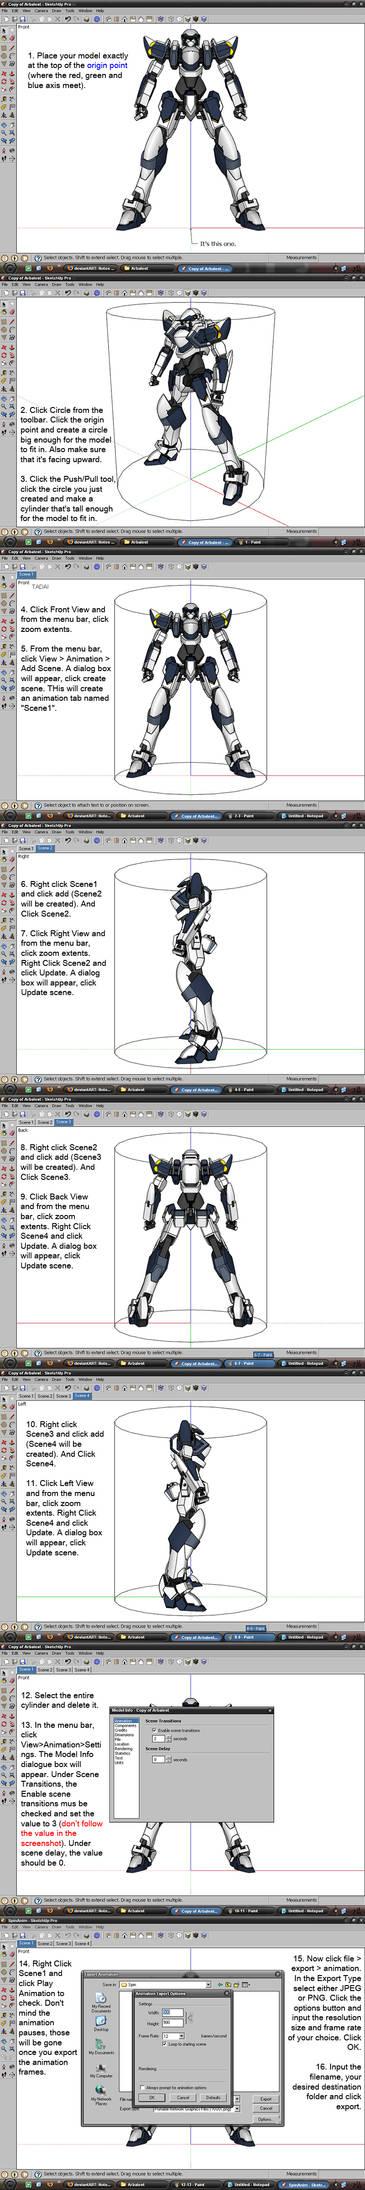 360 Anim. Frames in SketchUp